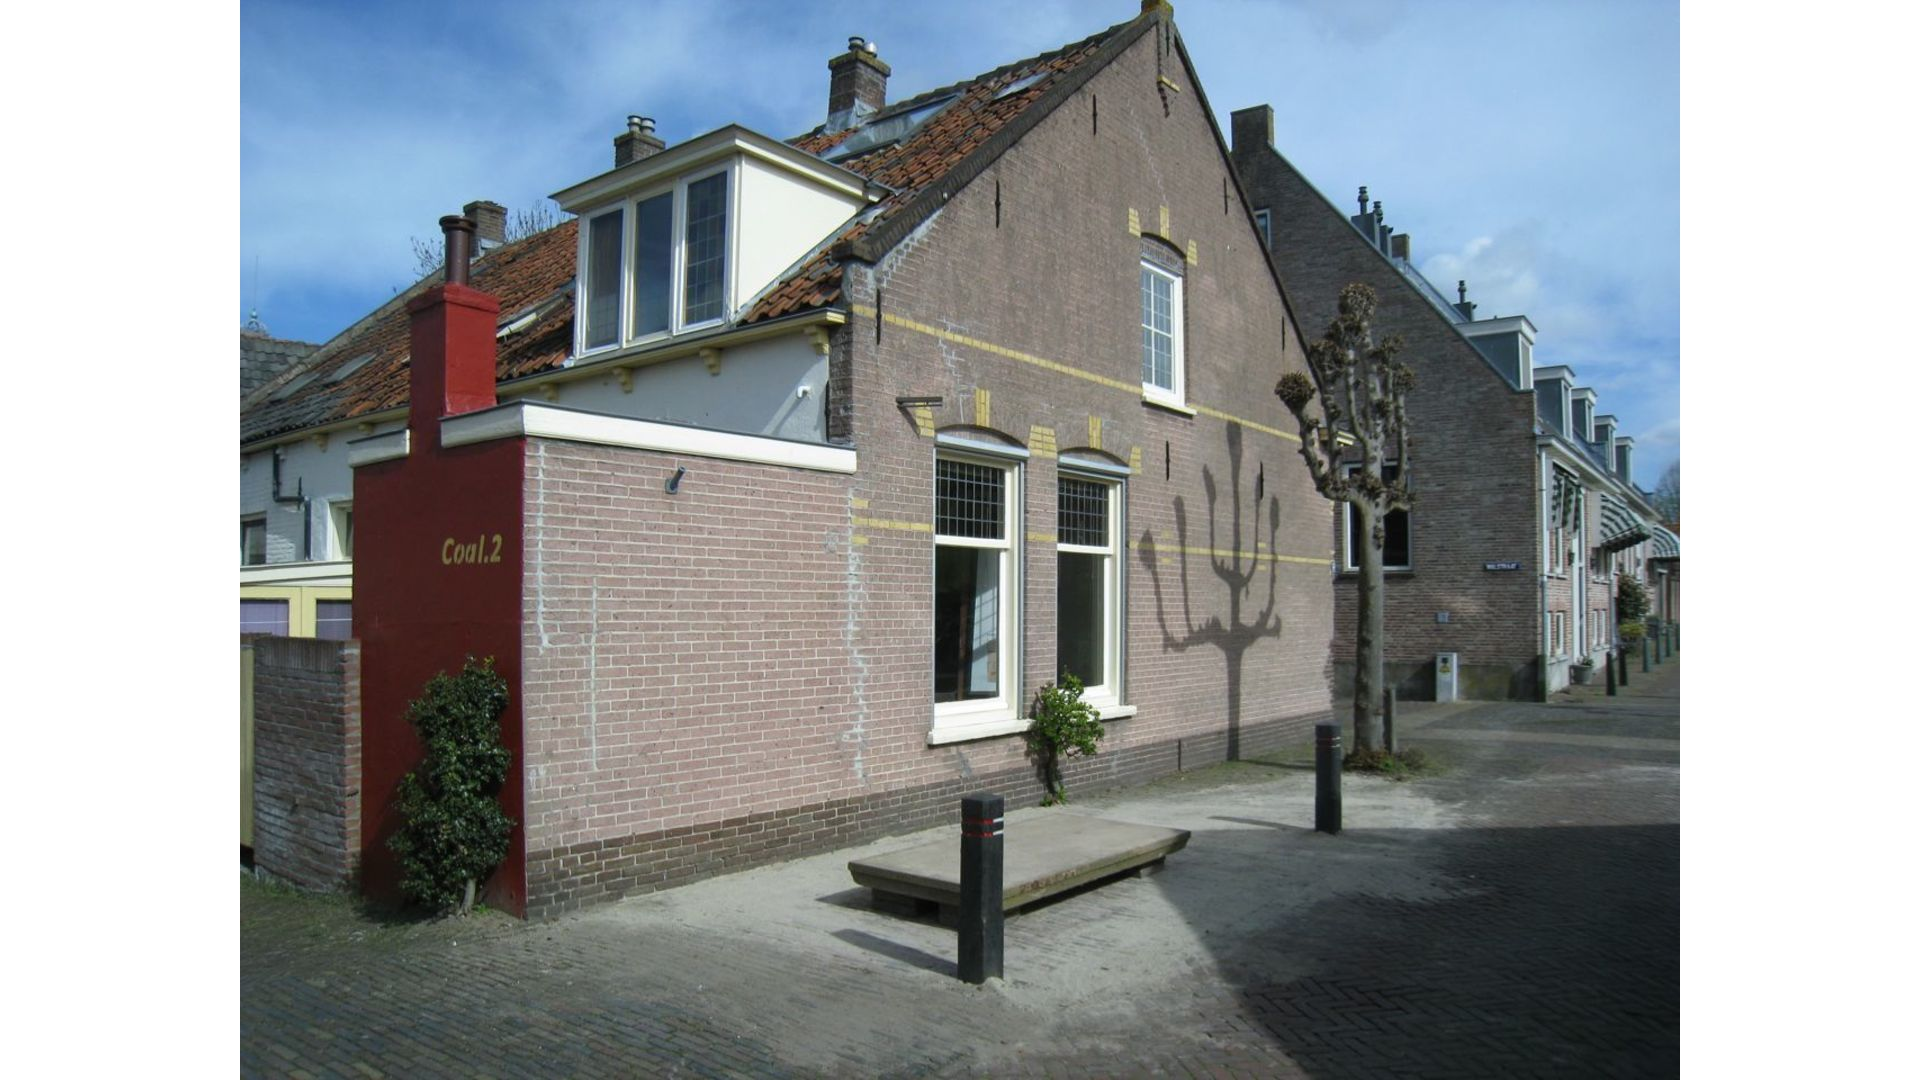 Wim van Sijl